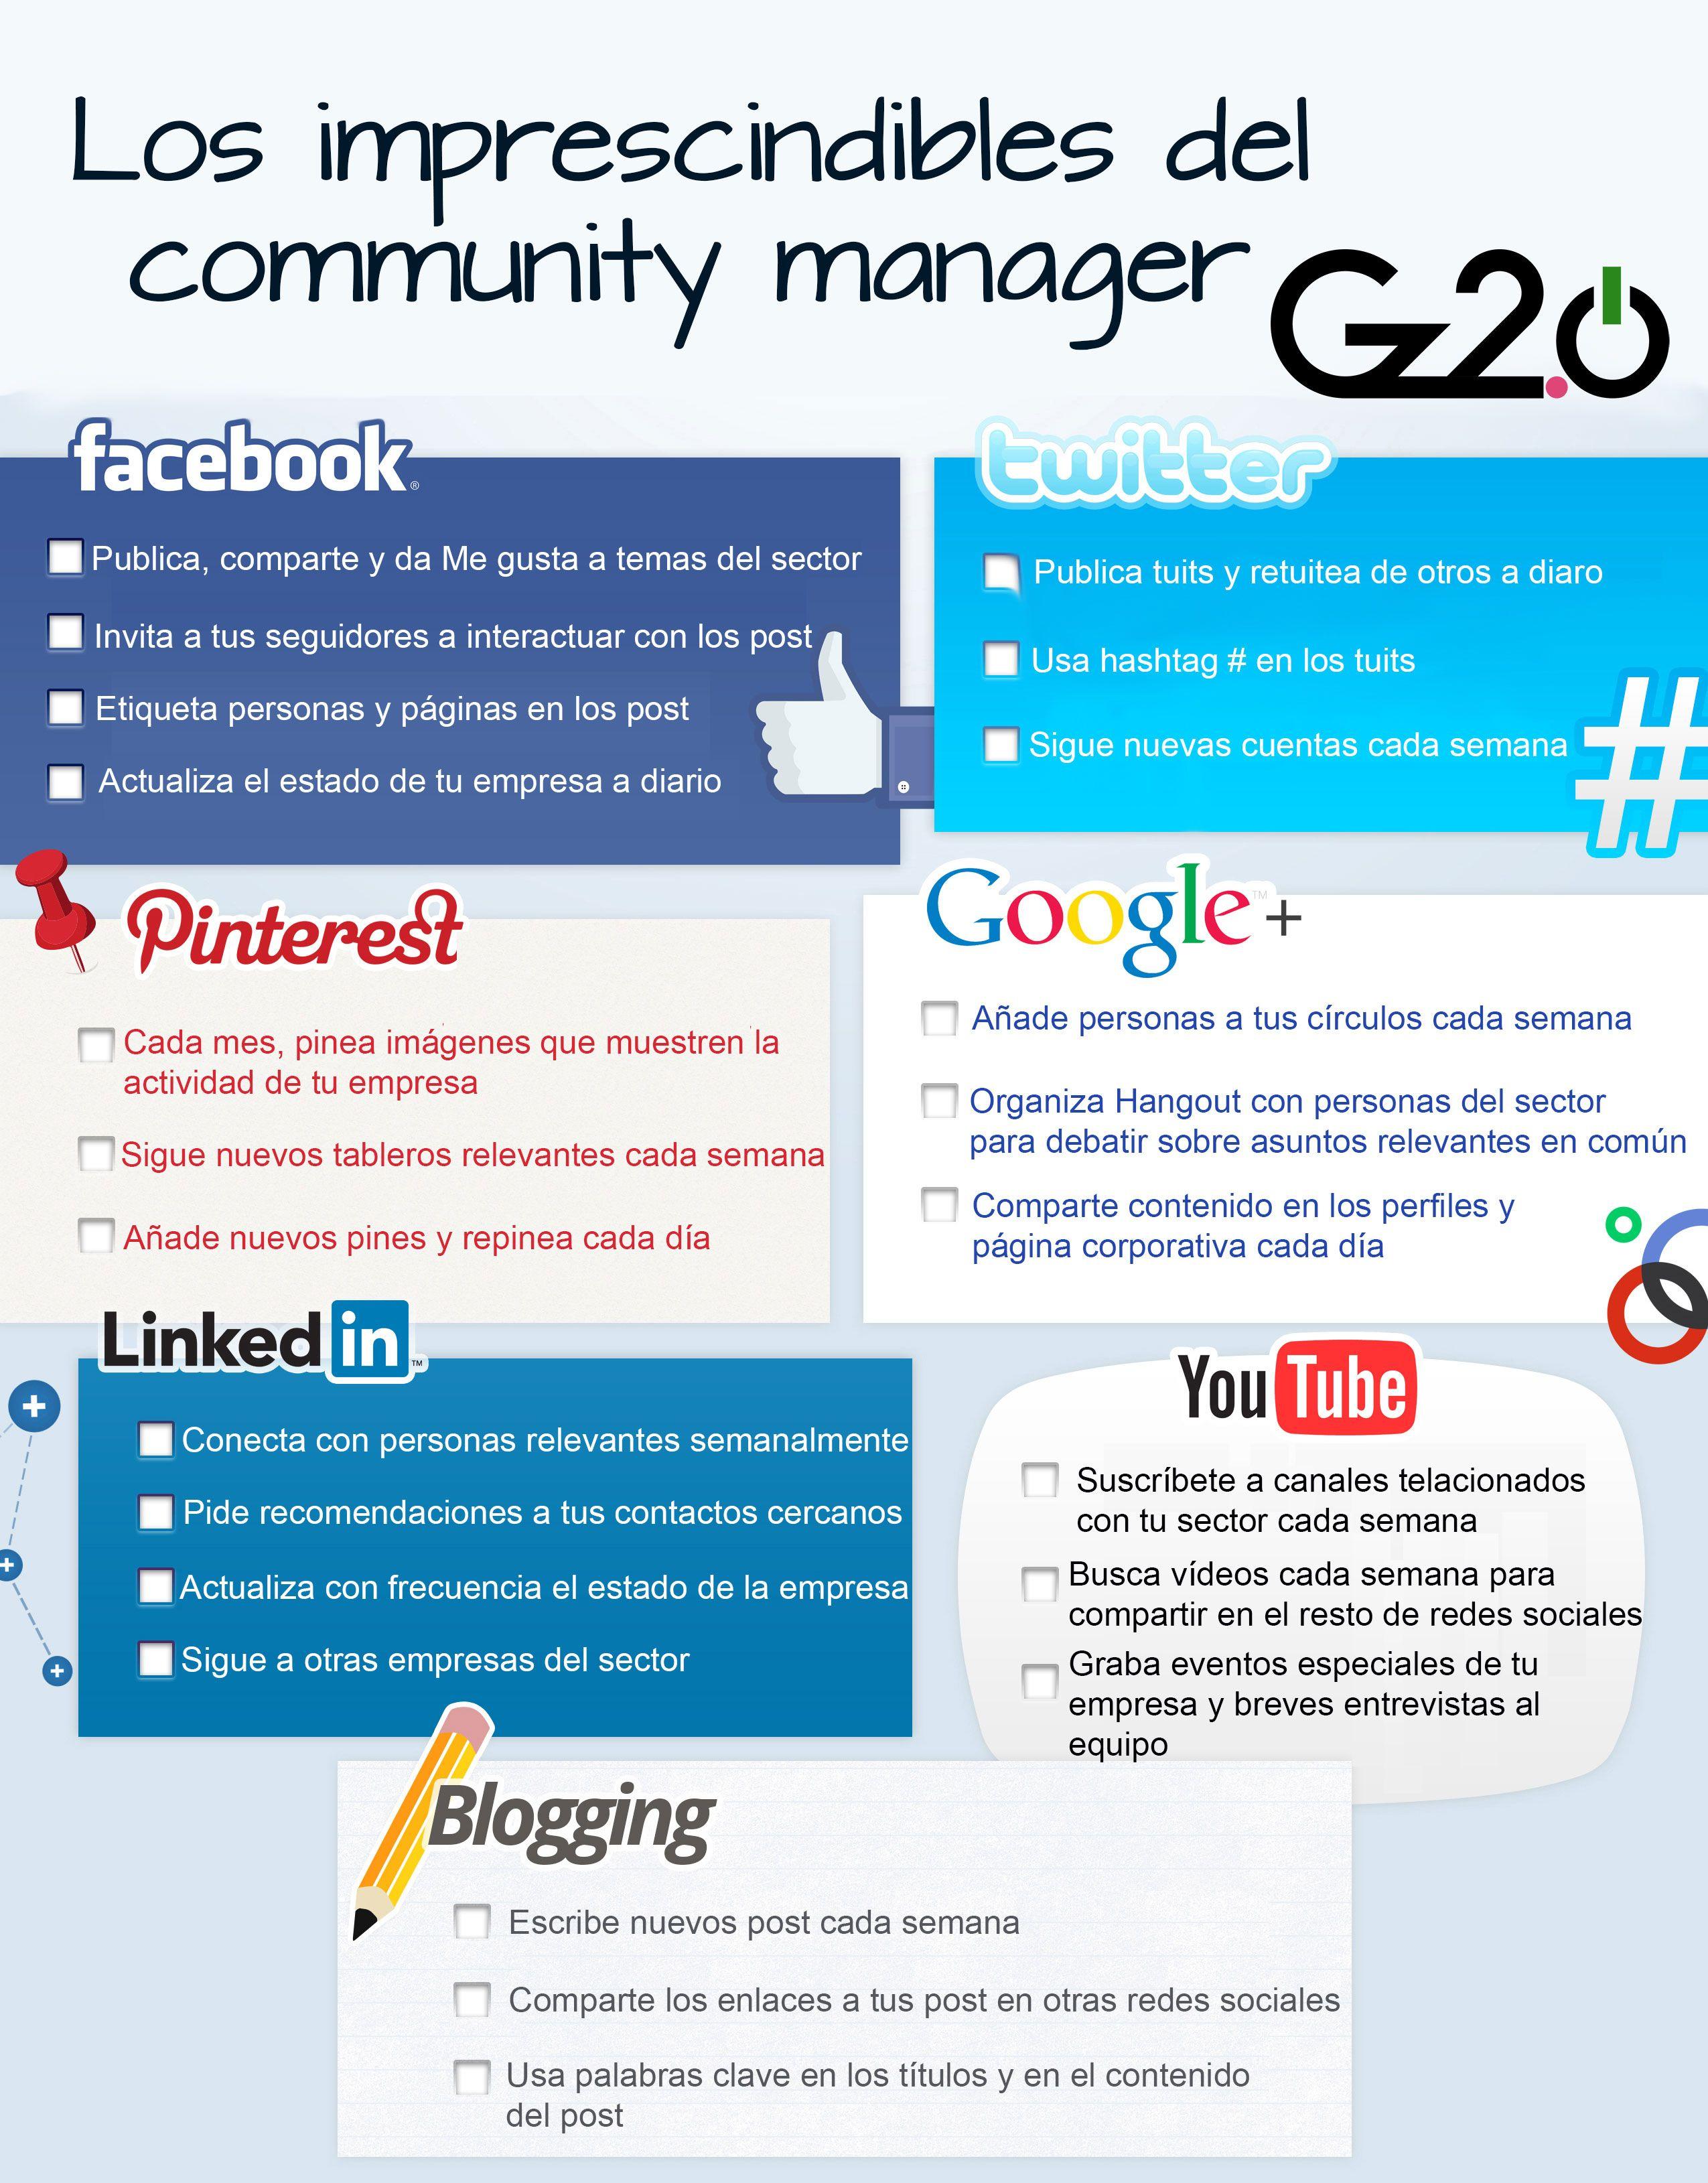 gz2puntocero-los-imprescindibles-del-comunity-manager